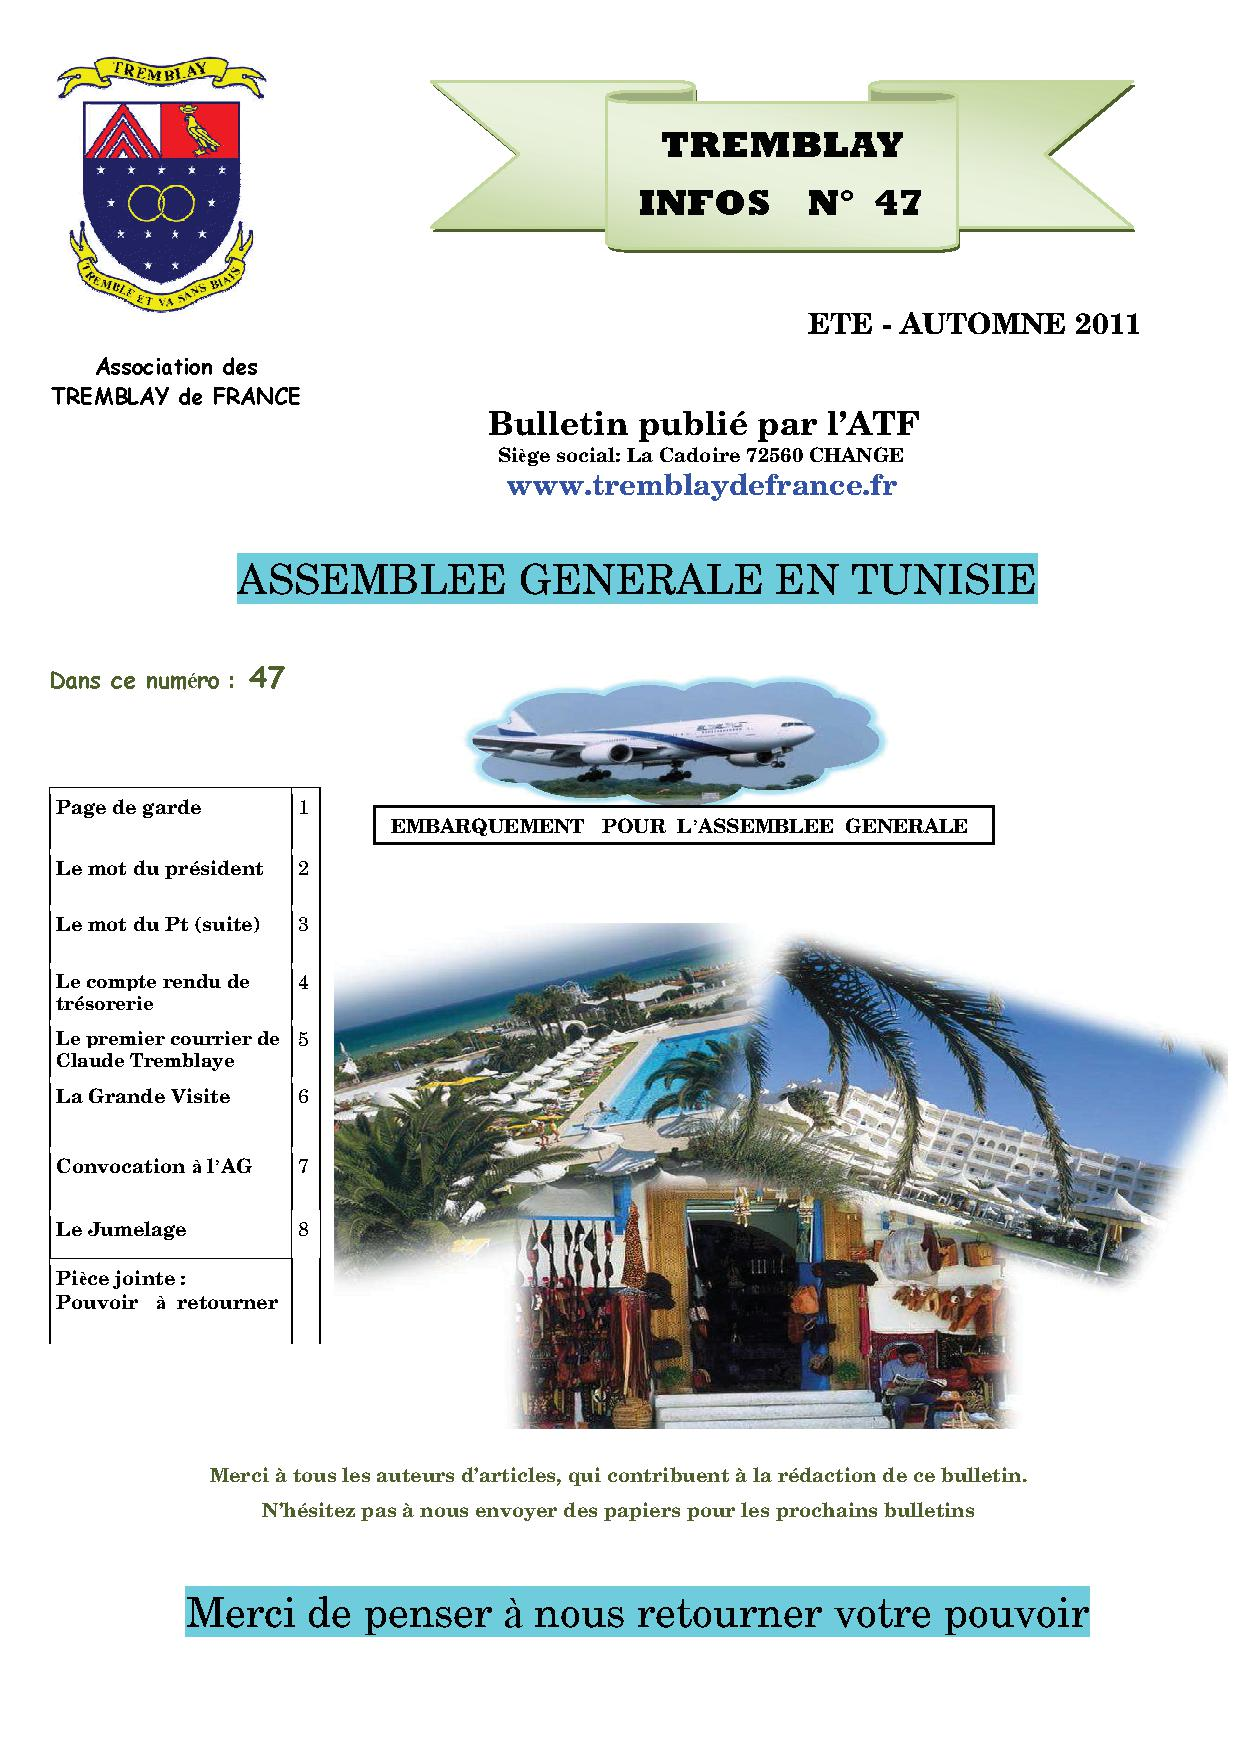 ETE - AUTOMNE 2011